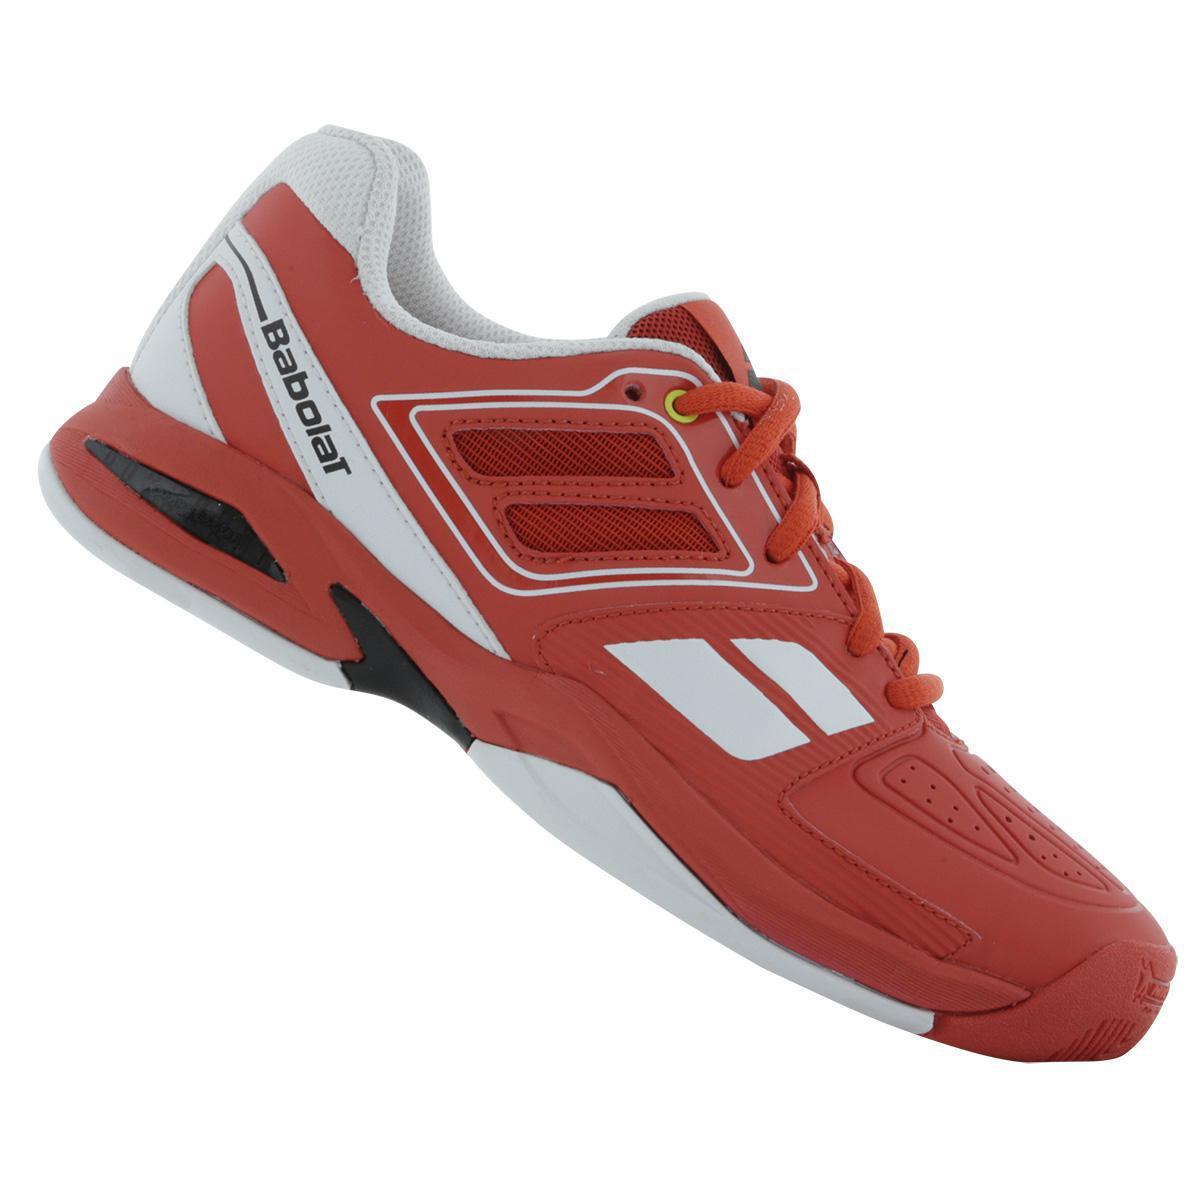 Chaussures Propulse Team Junior - Babolat inLrgExSV